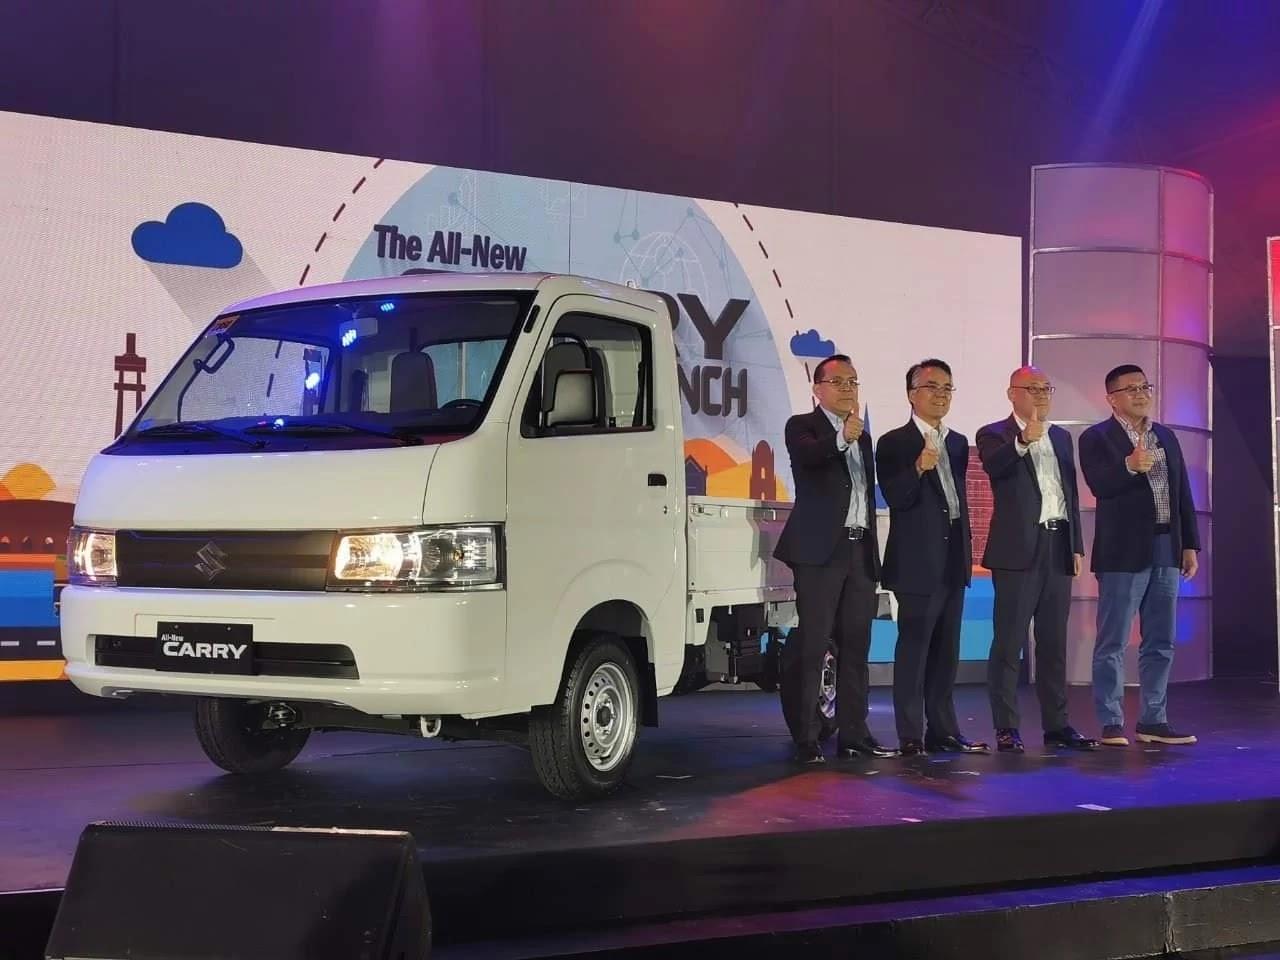 2020 Suzuki Carry Price In The Philippines Promos Specs Reviews Philkotse